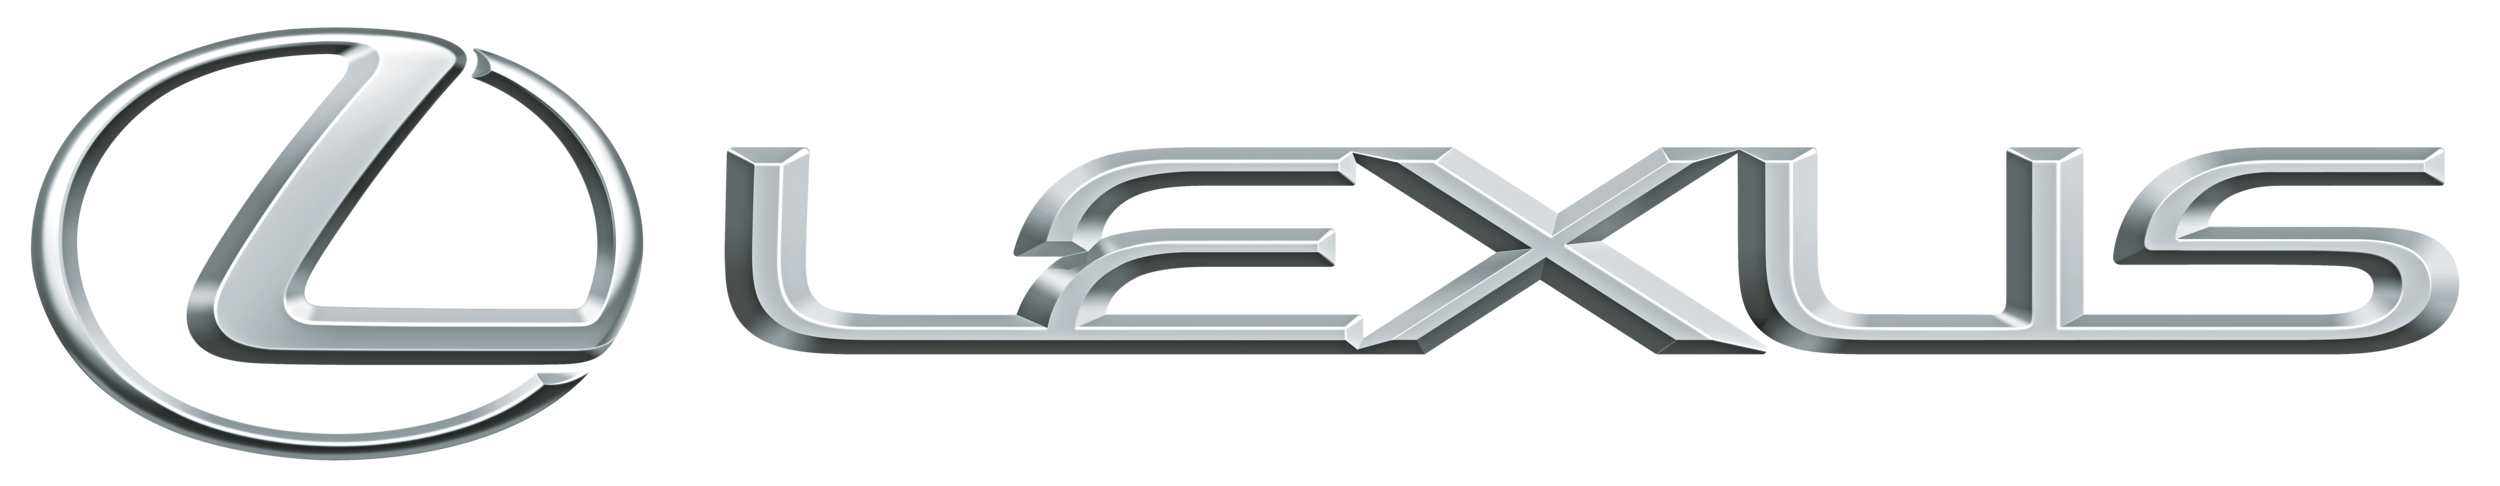 i_lexus-logo-horiz-large_full.png